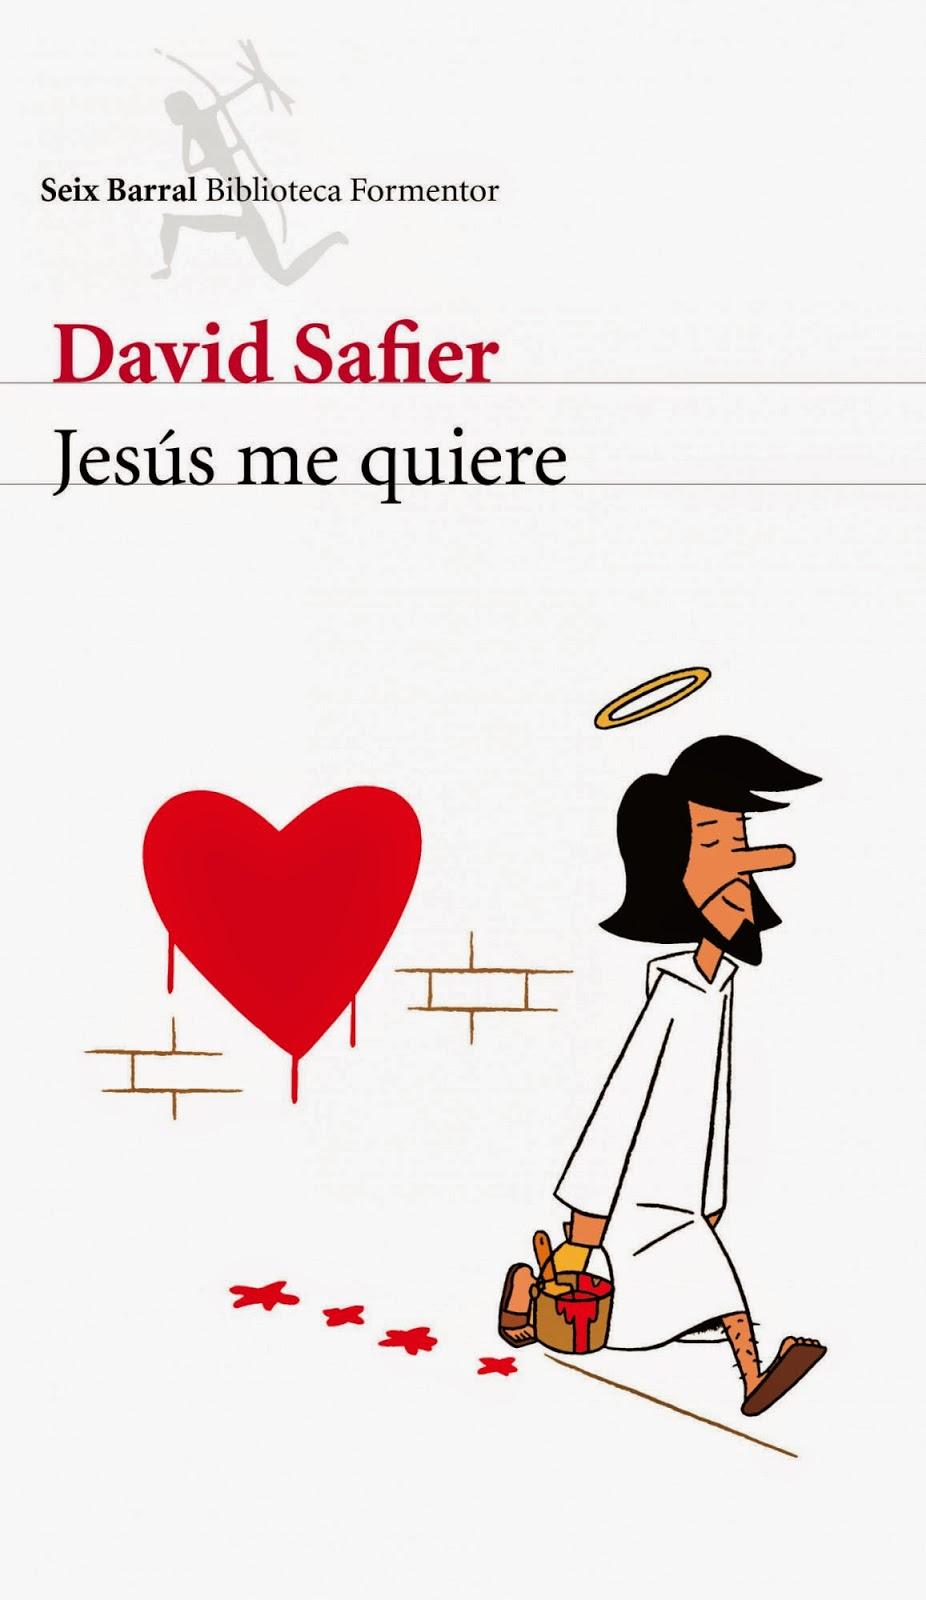 http://almastintadas.blogspot.com.es/2011/11/jesus-me-quiere.html